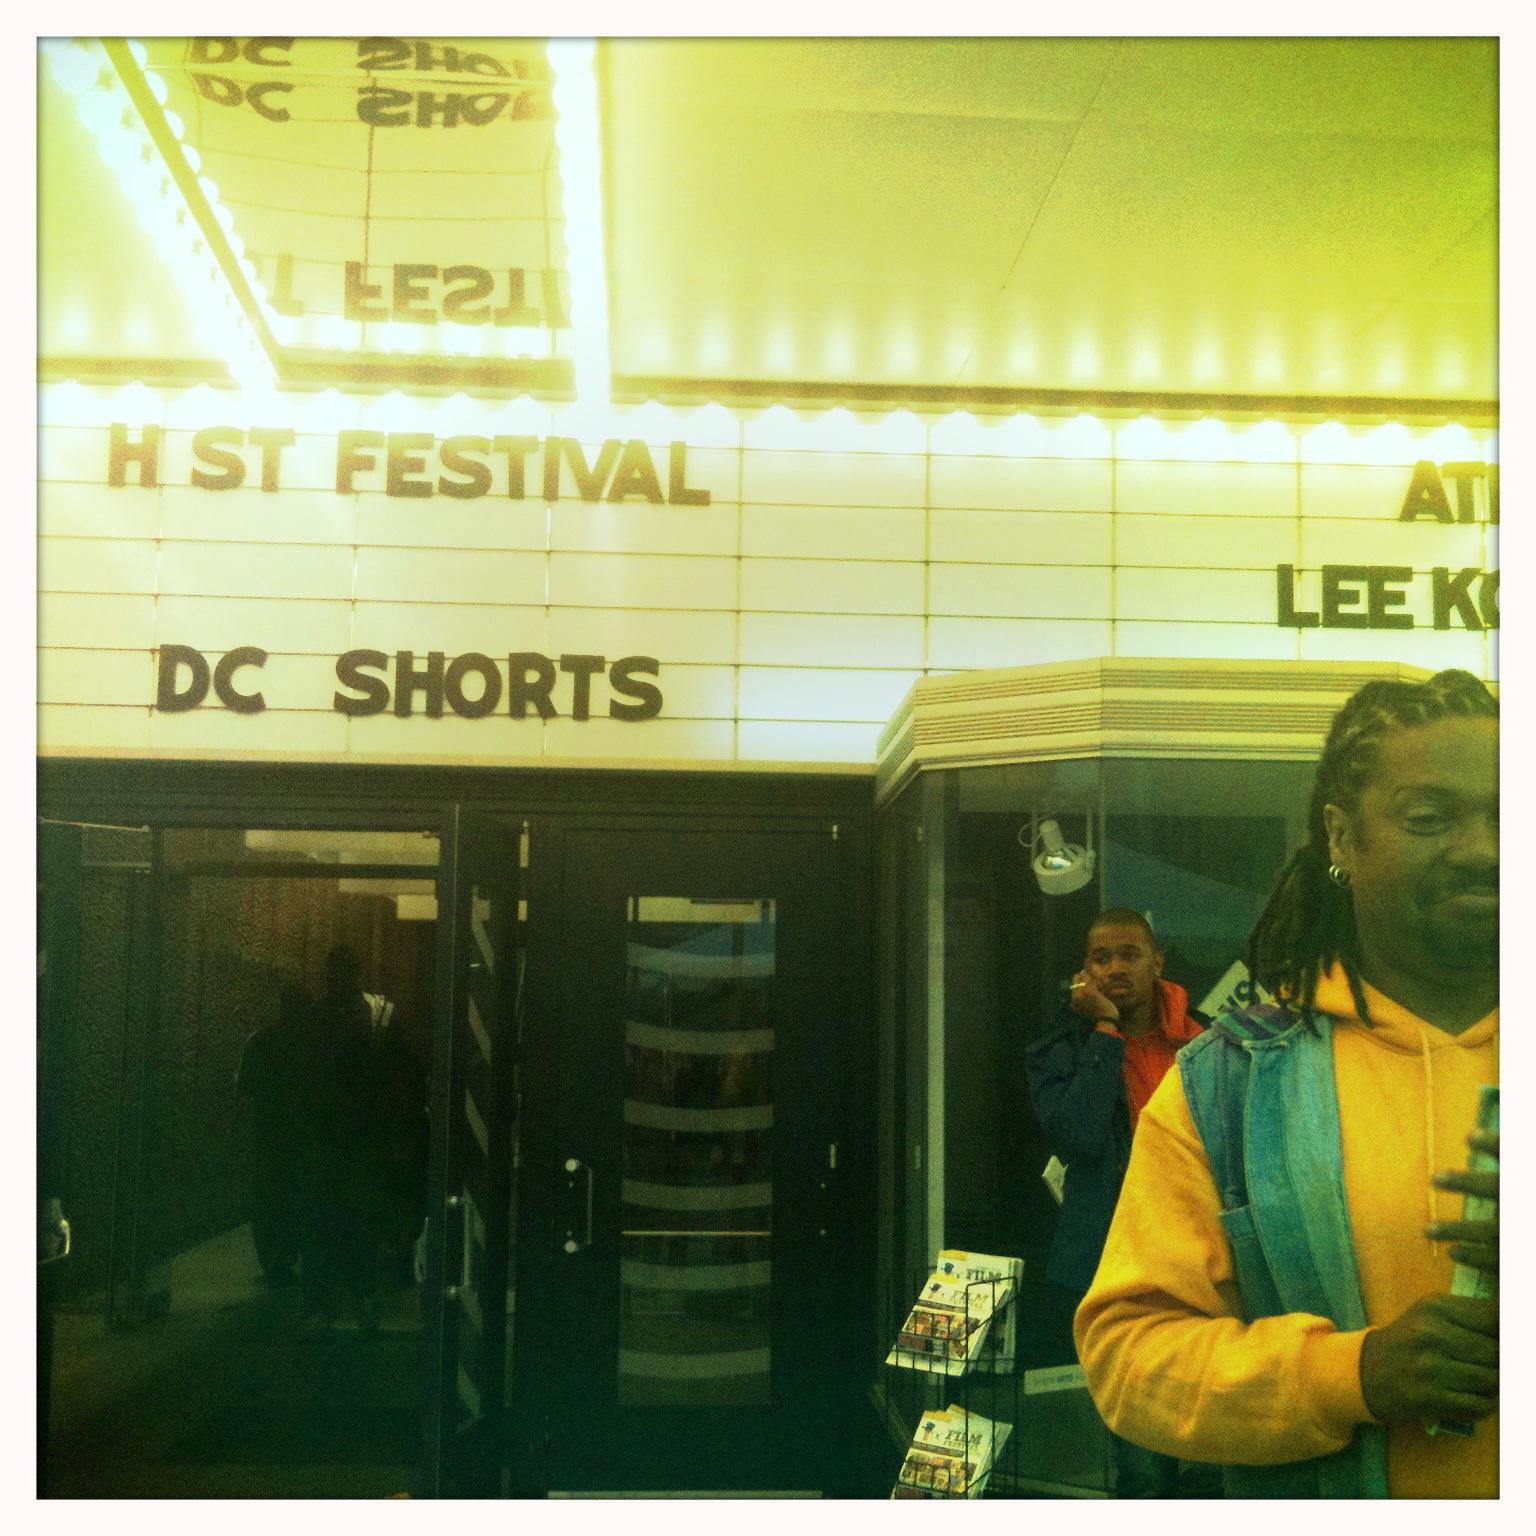 DC Shorts Film Festival, Atlas Theater, Fall 2011, Washington, DC, H St. NE